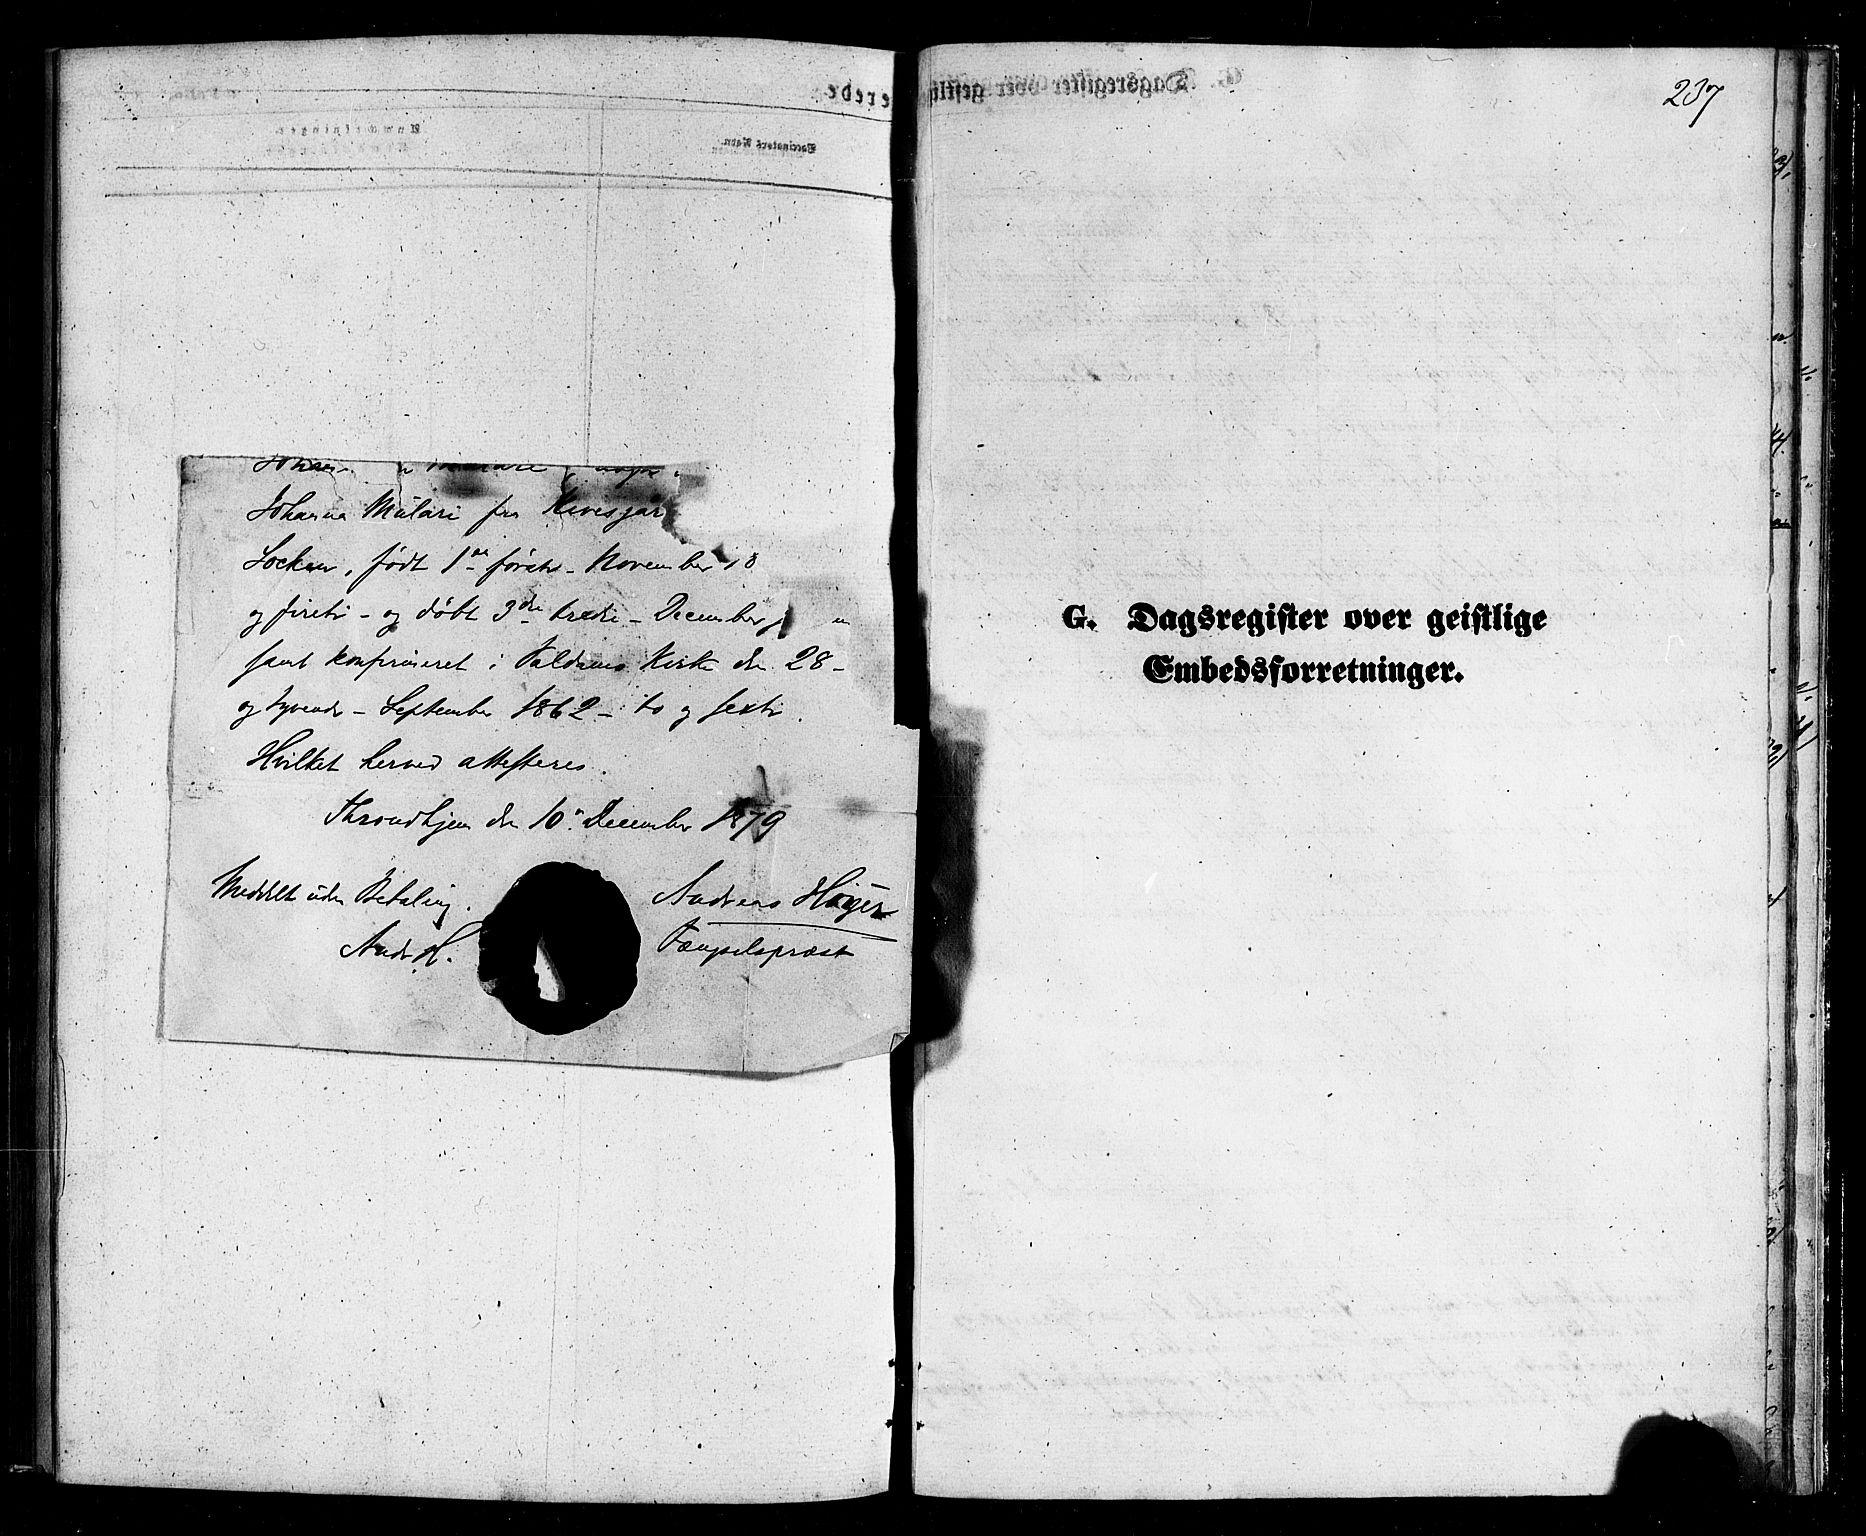 SAT, Ministerialprotokoller, klokkerbøker og fødselsregistre - Nordland, 803/L0075: Klokkerbok nr. 803C02, 1867-1881, s. 237